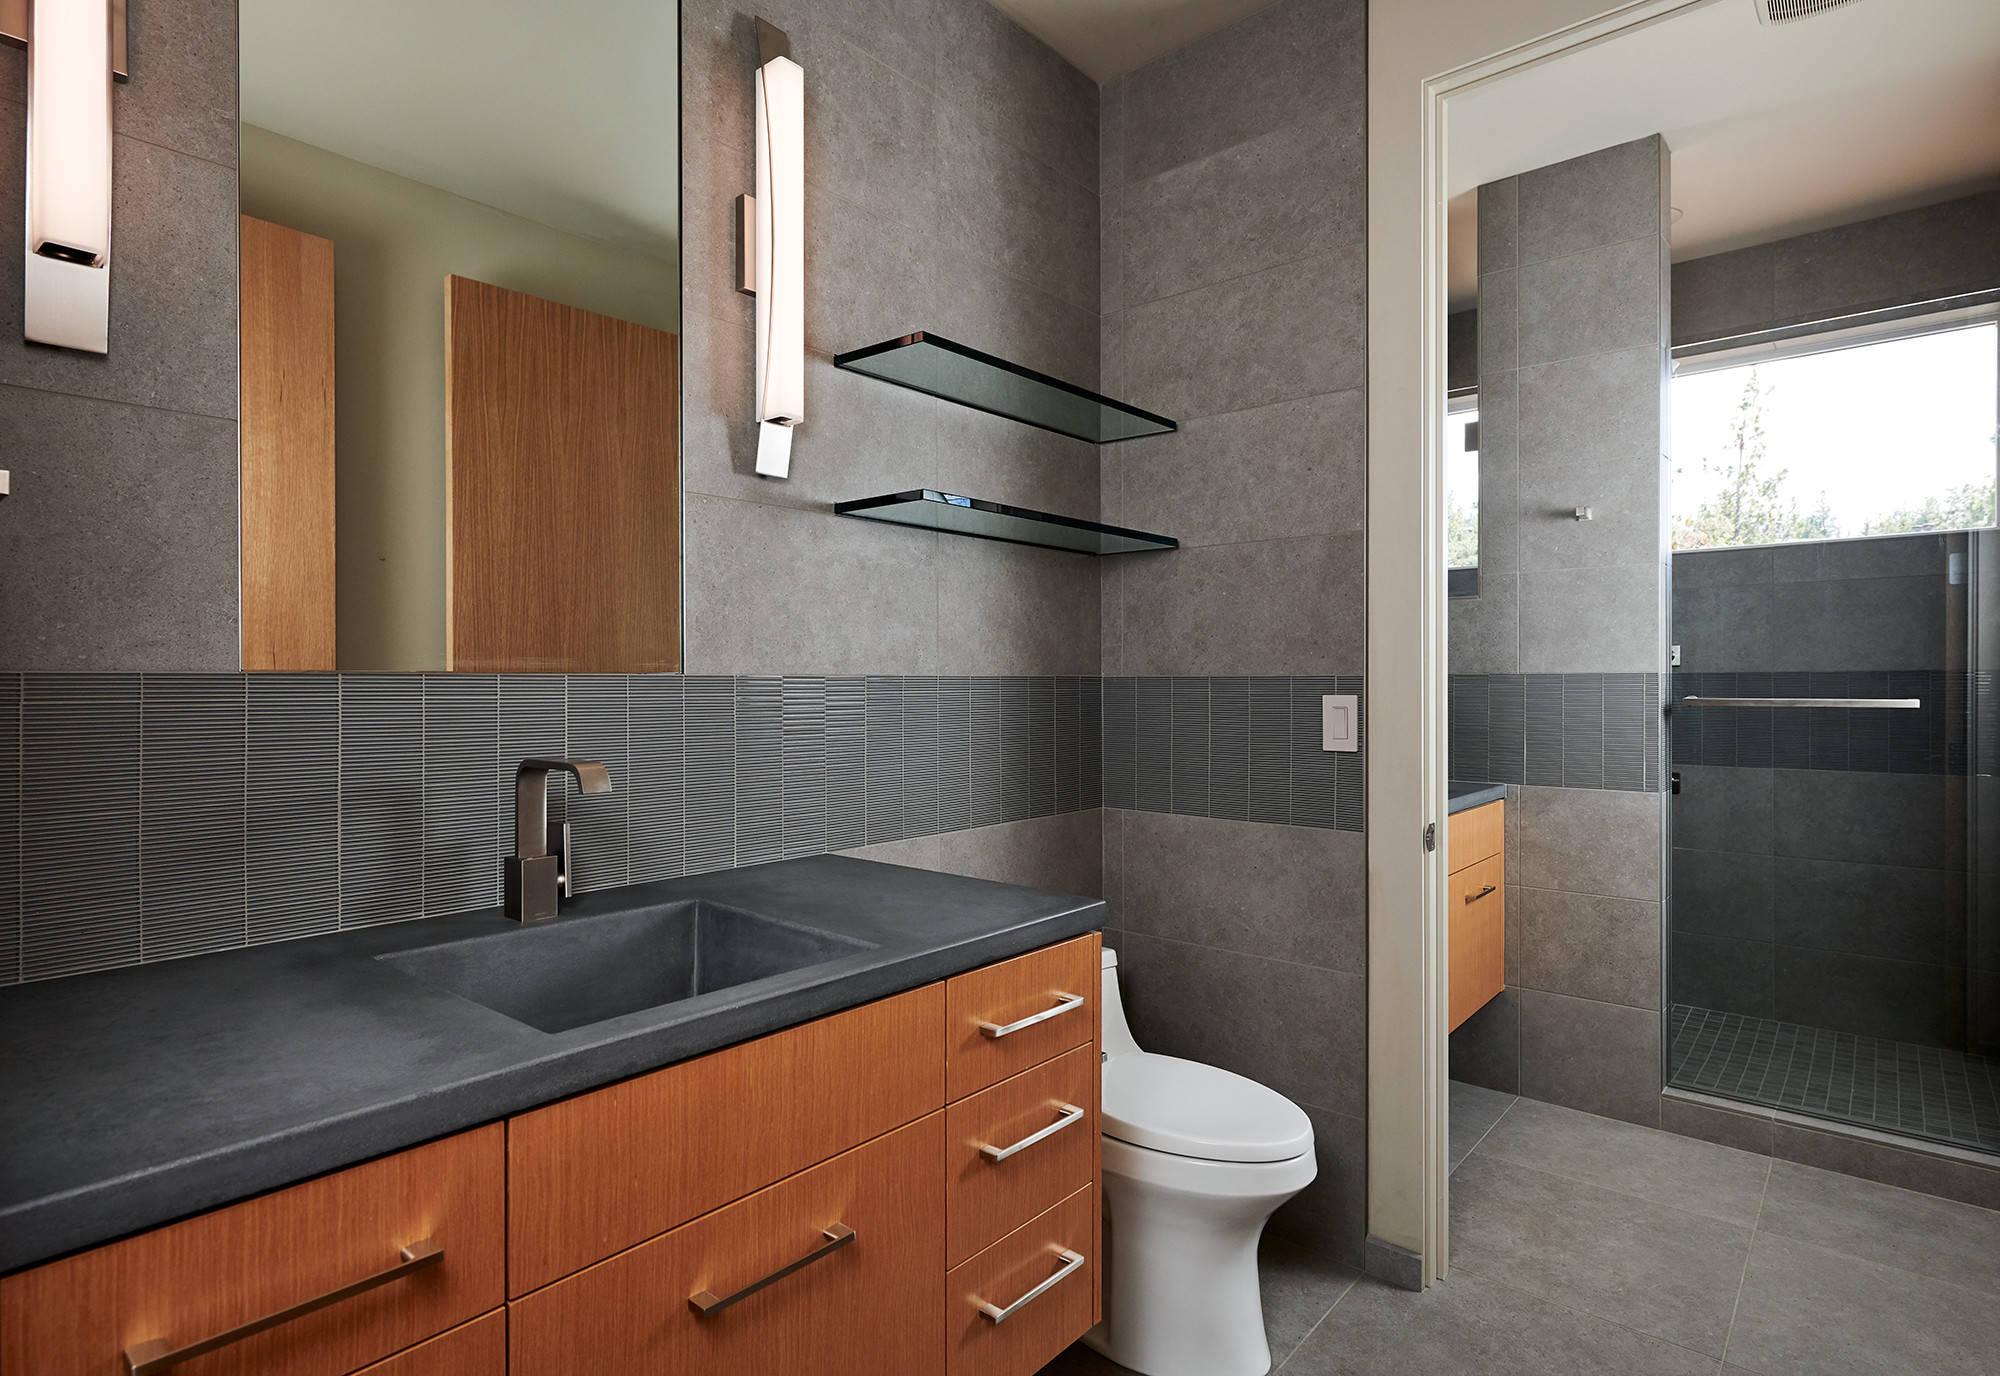 Bathroom With Concrete Countertops